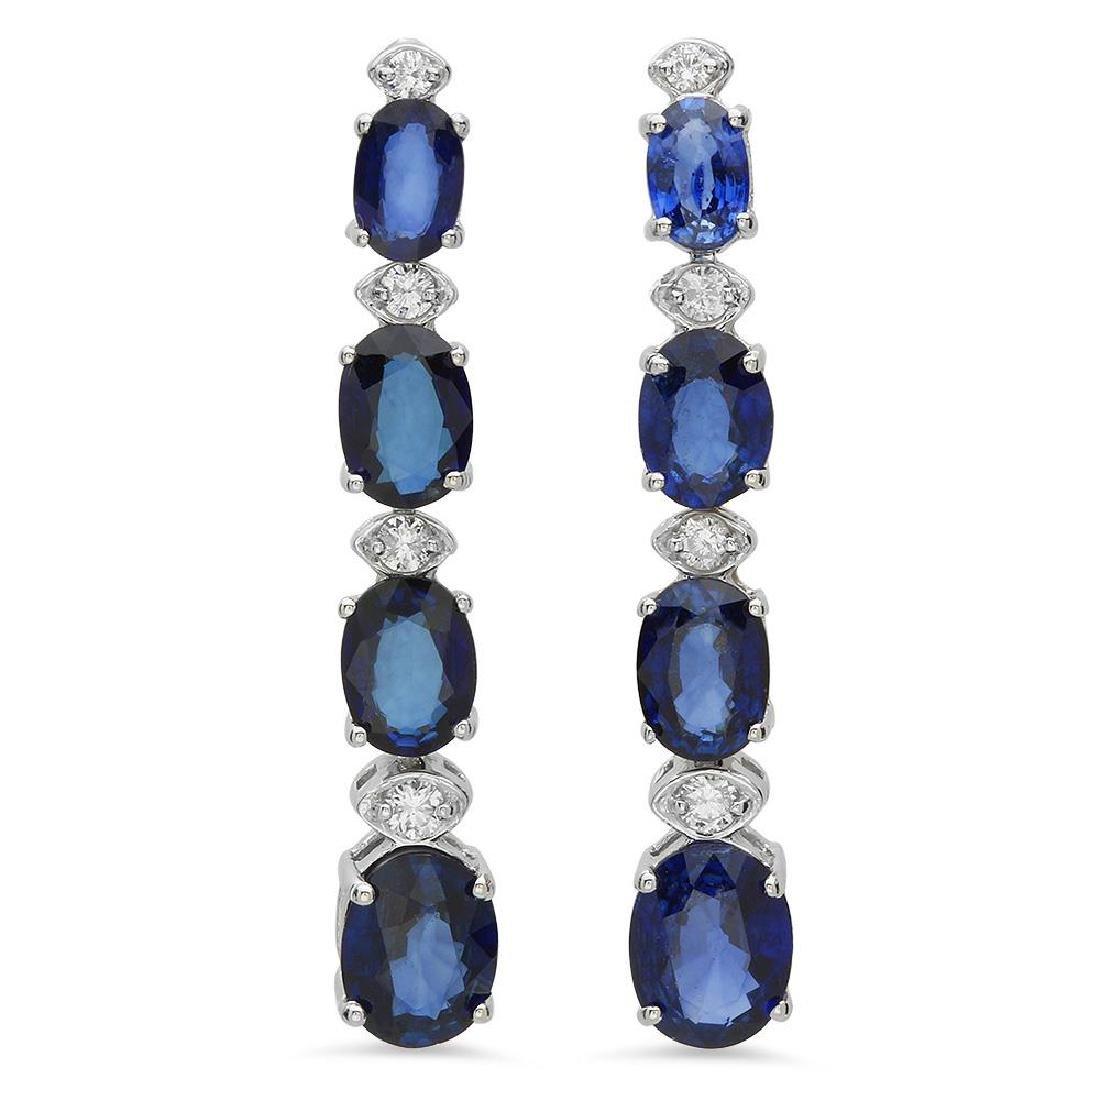 14K Gold 7.41ct Sapphire 0.31ct Diamond Earrings